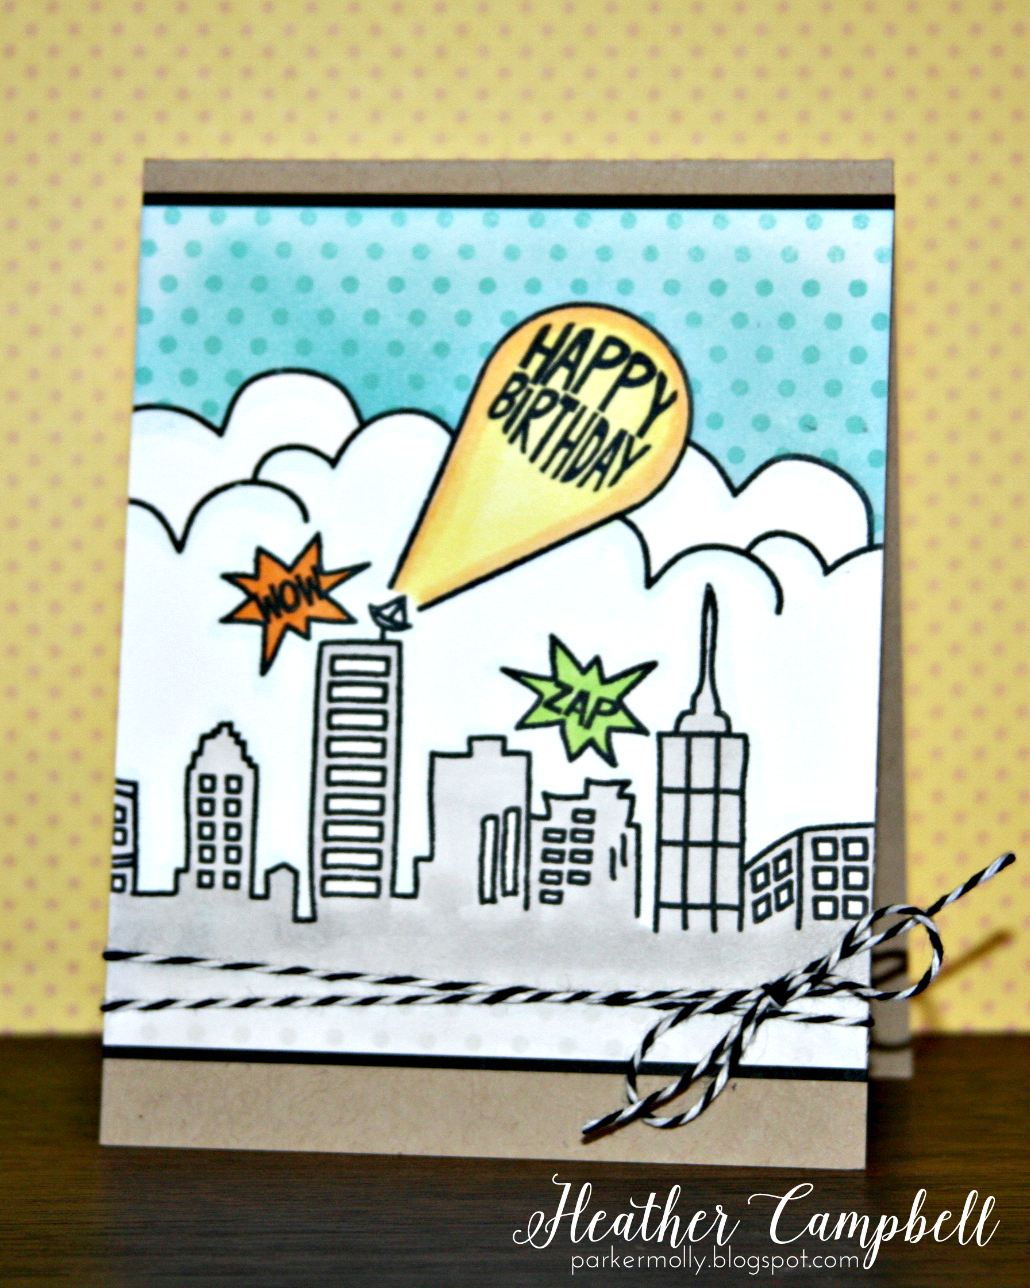 http://4.bp.blogspot.com/-aerN7nBGIRQ/VOqyXrVGksI/AAAAAAAAD8I/Pm6pF6xi81I/s1600/Heather_Super.JPG